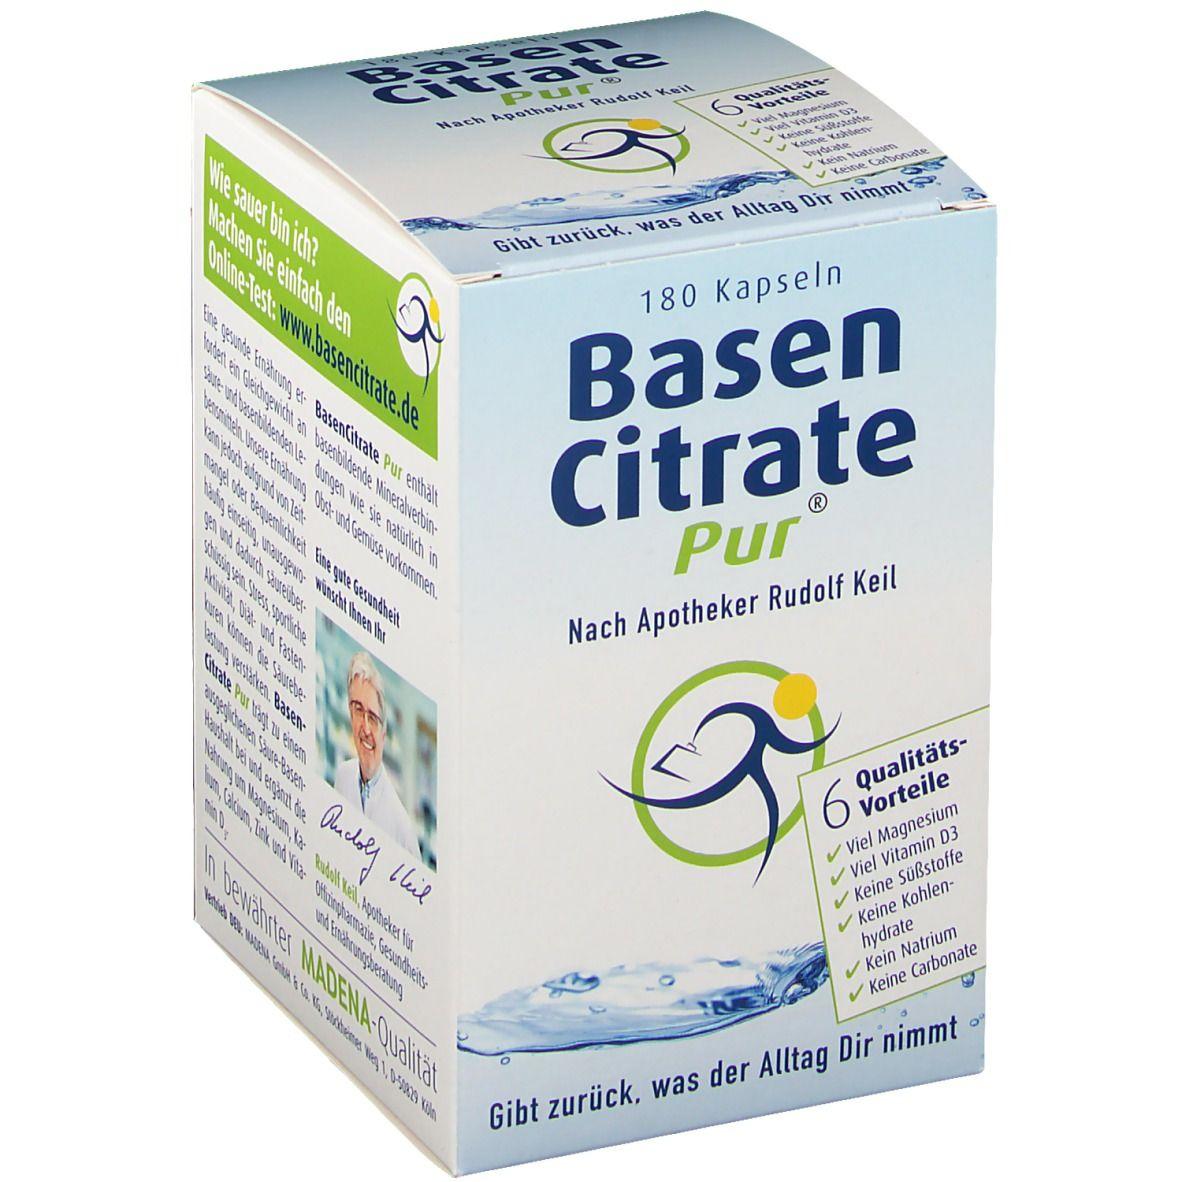 Image of Basen Citrate Pur® Nach Apotheker Rudolf Keil